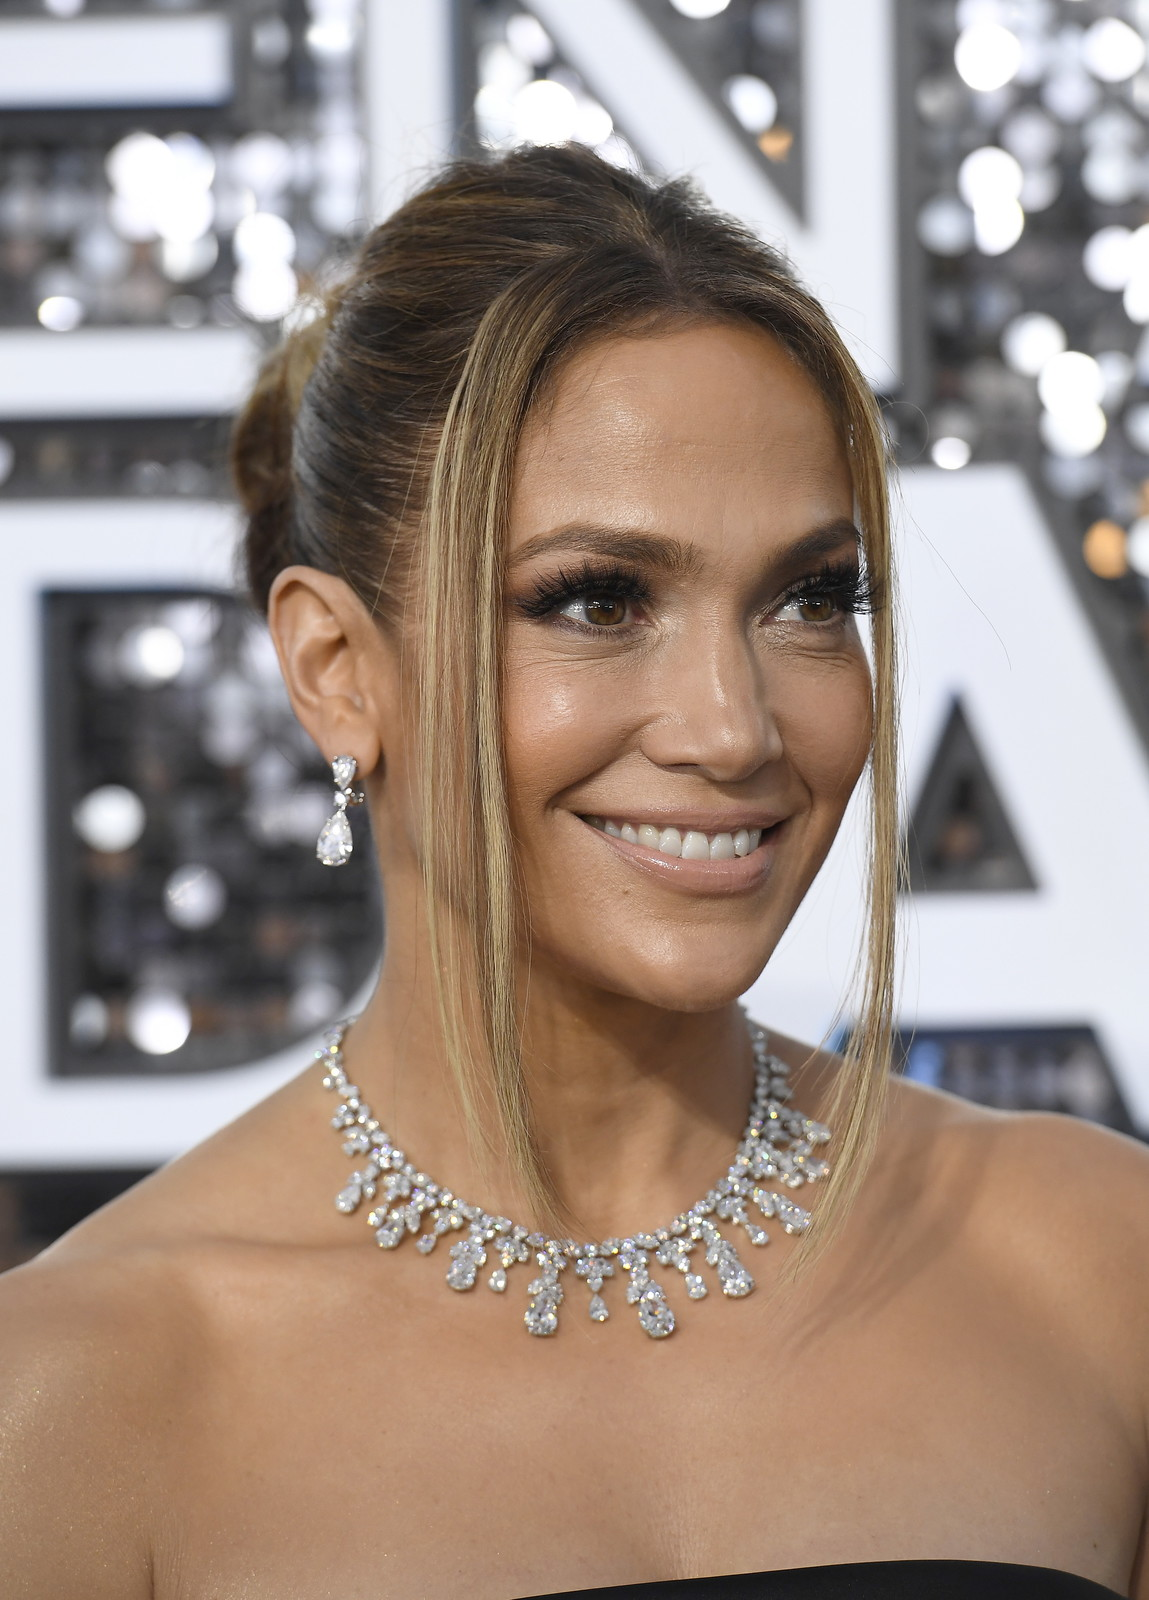 Shakira, insieme a Jennifer Lopez, sarà la grande protagonista dell'attesissimo Halftime Show.